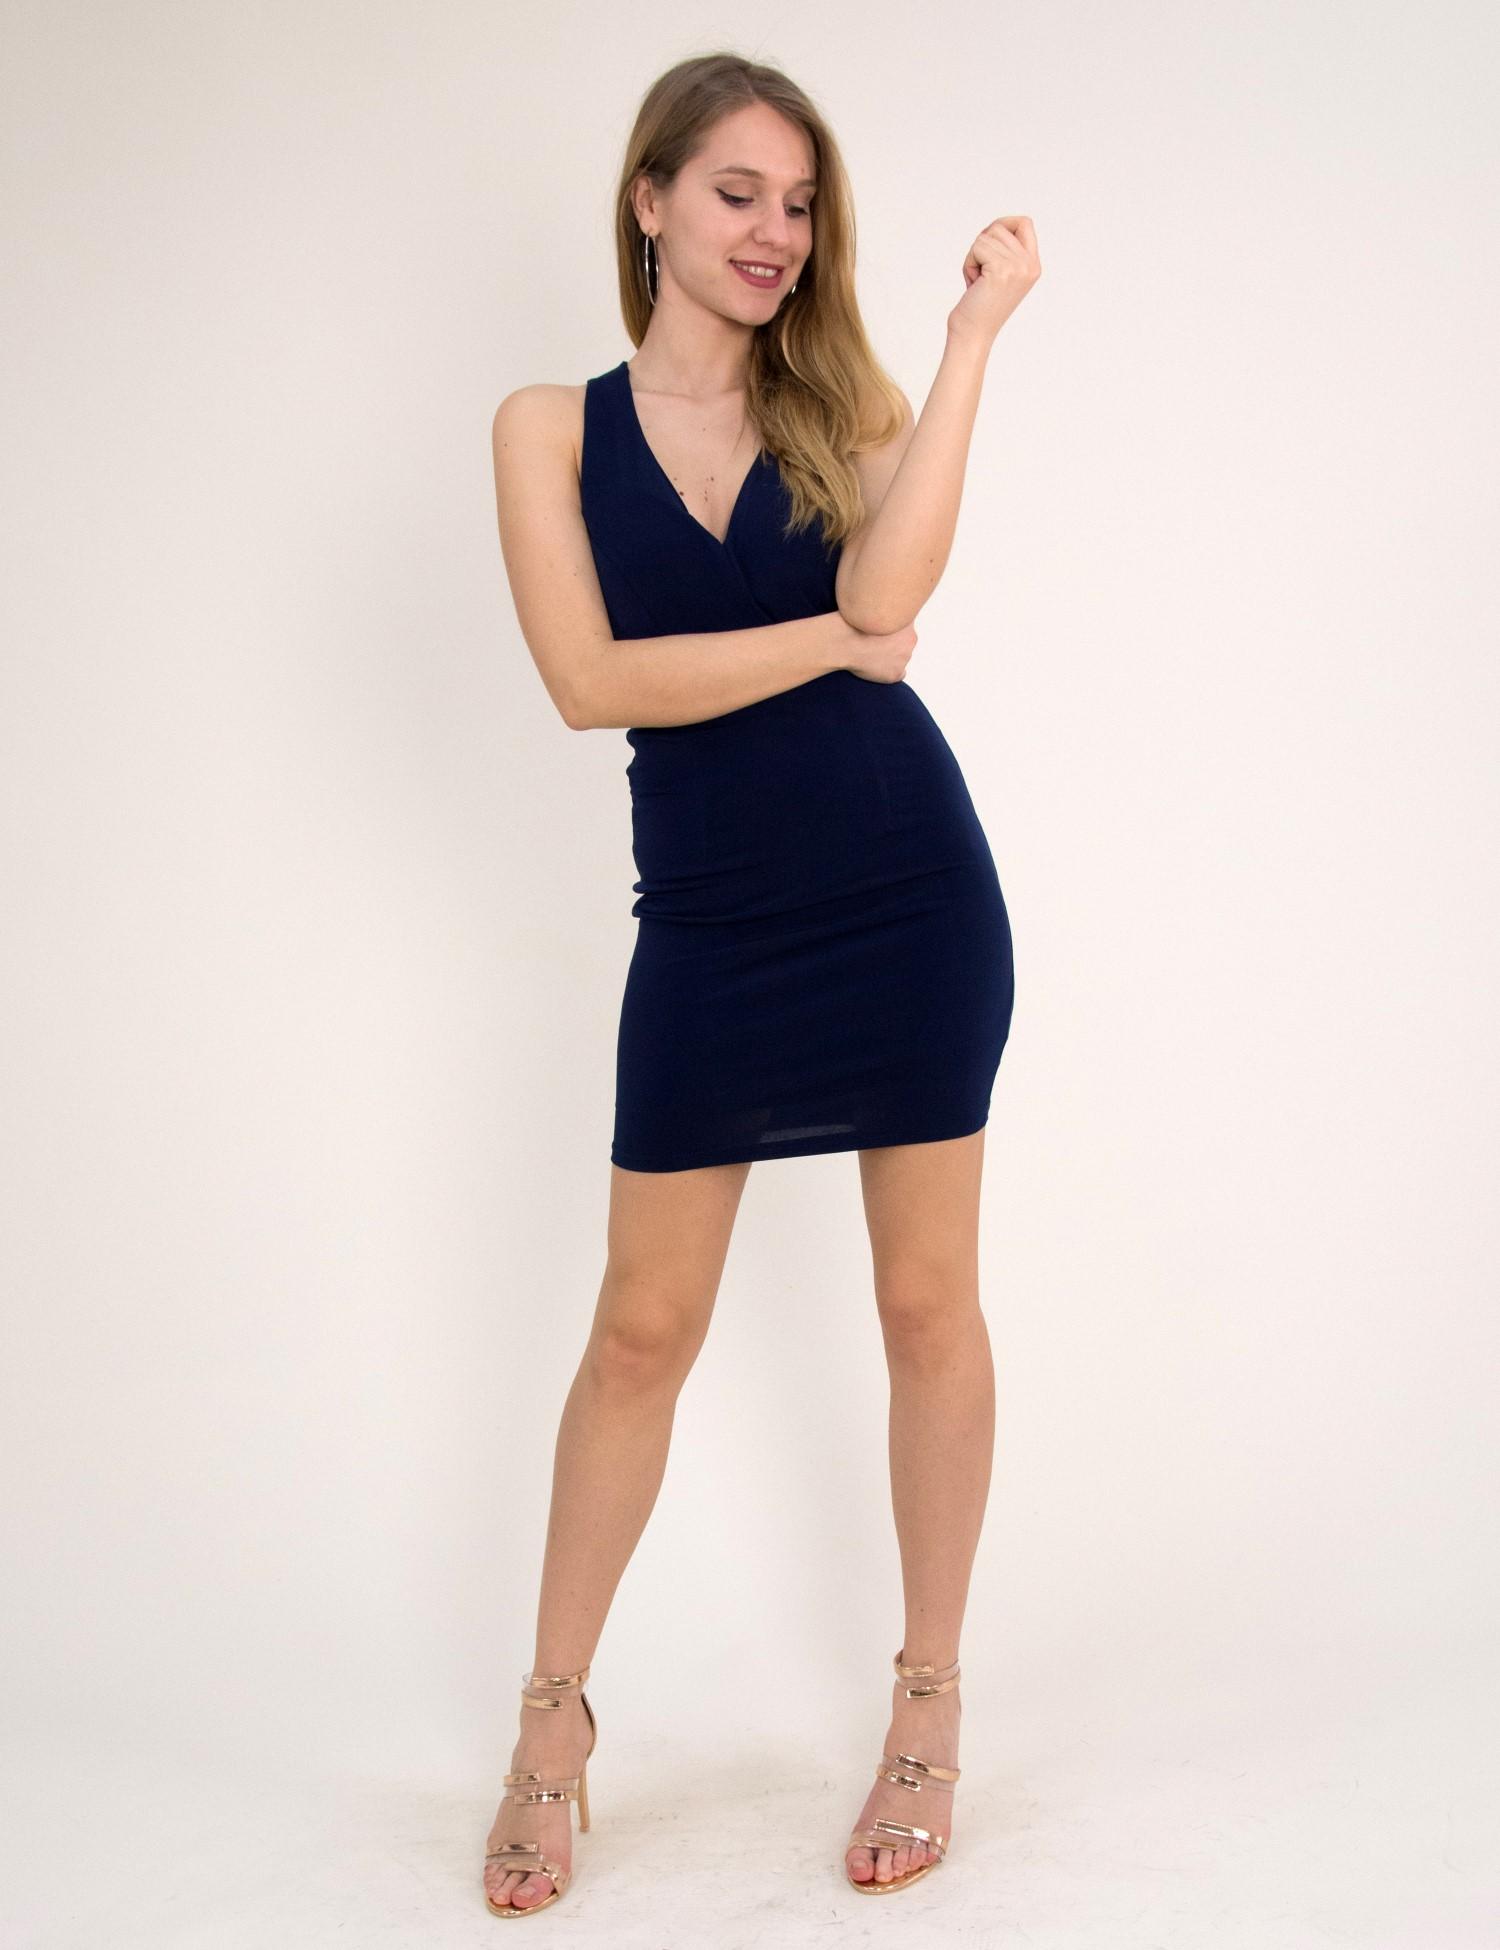 c35383d5a748 Γυναικείο κοντό φόρεμα με βαθύ ντεκολτέ μπλε 7466165